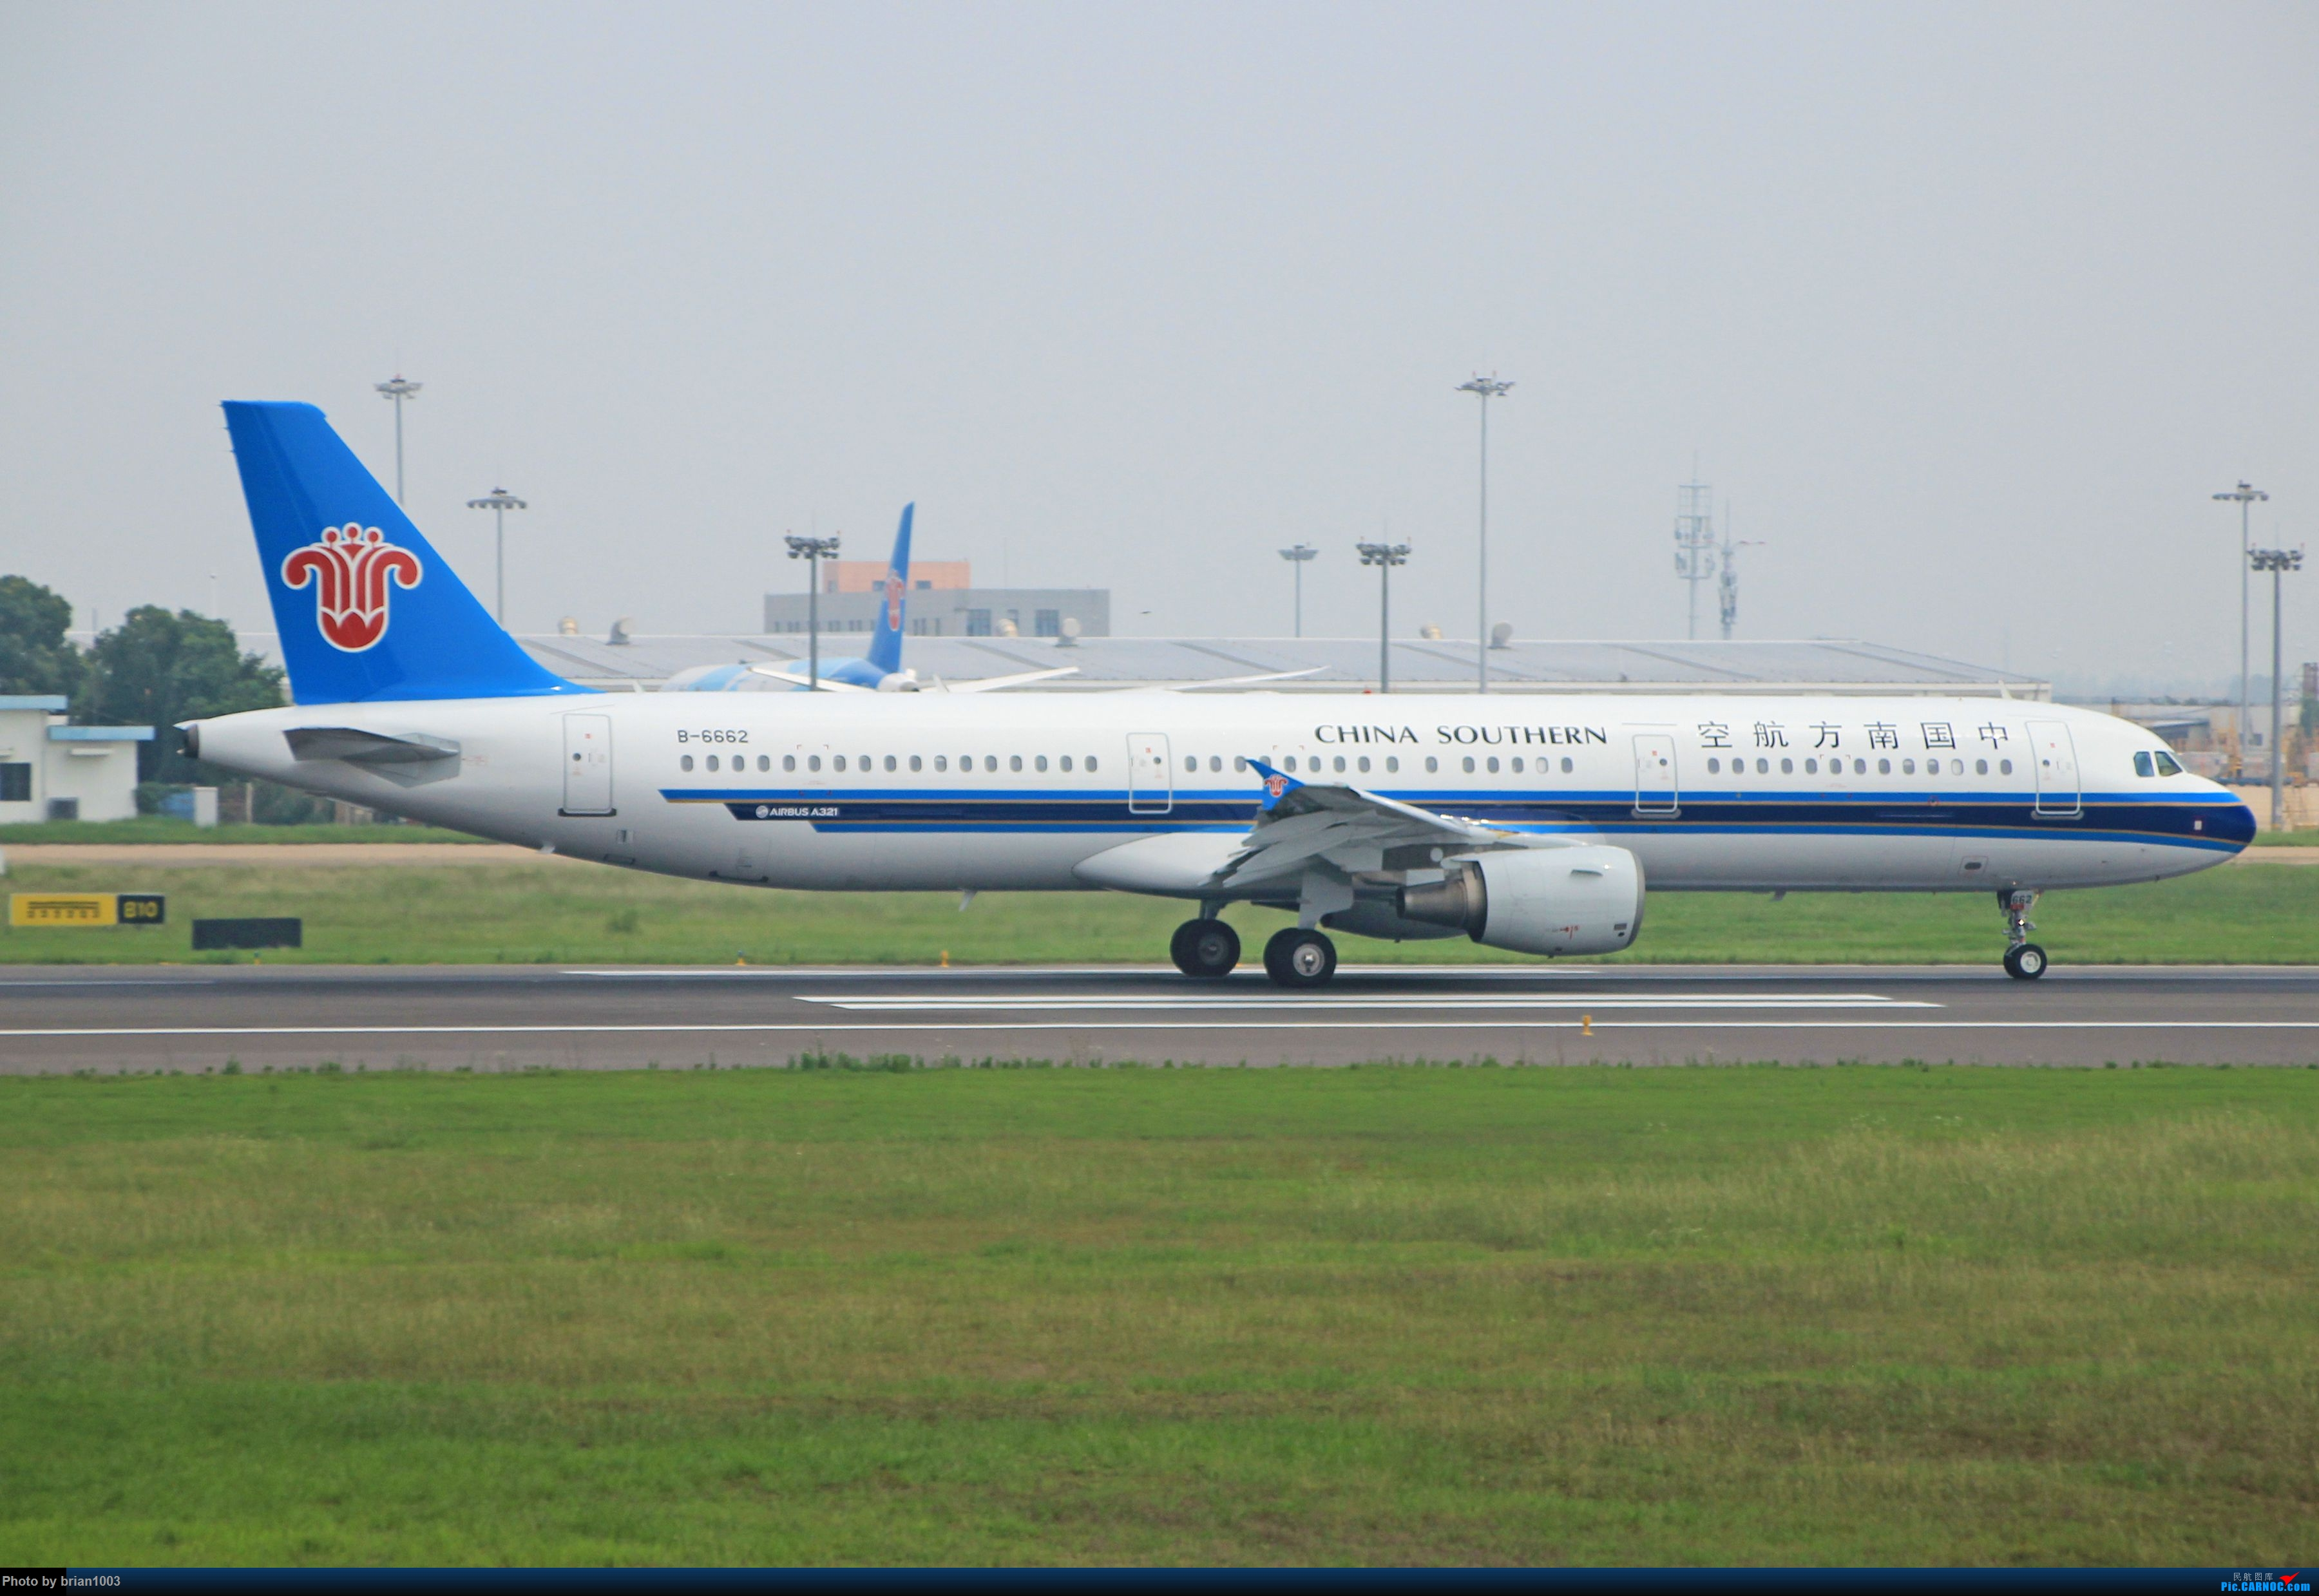 Re:[原创]WUH天河机场拍机之六月还有啥(X7家744F、天津大韩港龙333、巴基斯坦772、B6419、ER-BBJ 74F、某菊塞斯纳、俄航77W) AIRBUS A321-200 B-6662 中国武汉天河国际机场